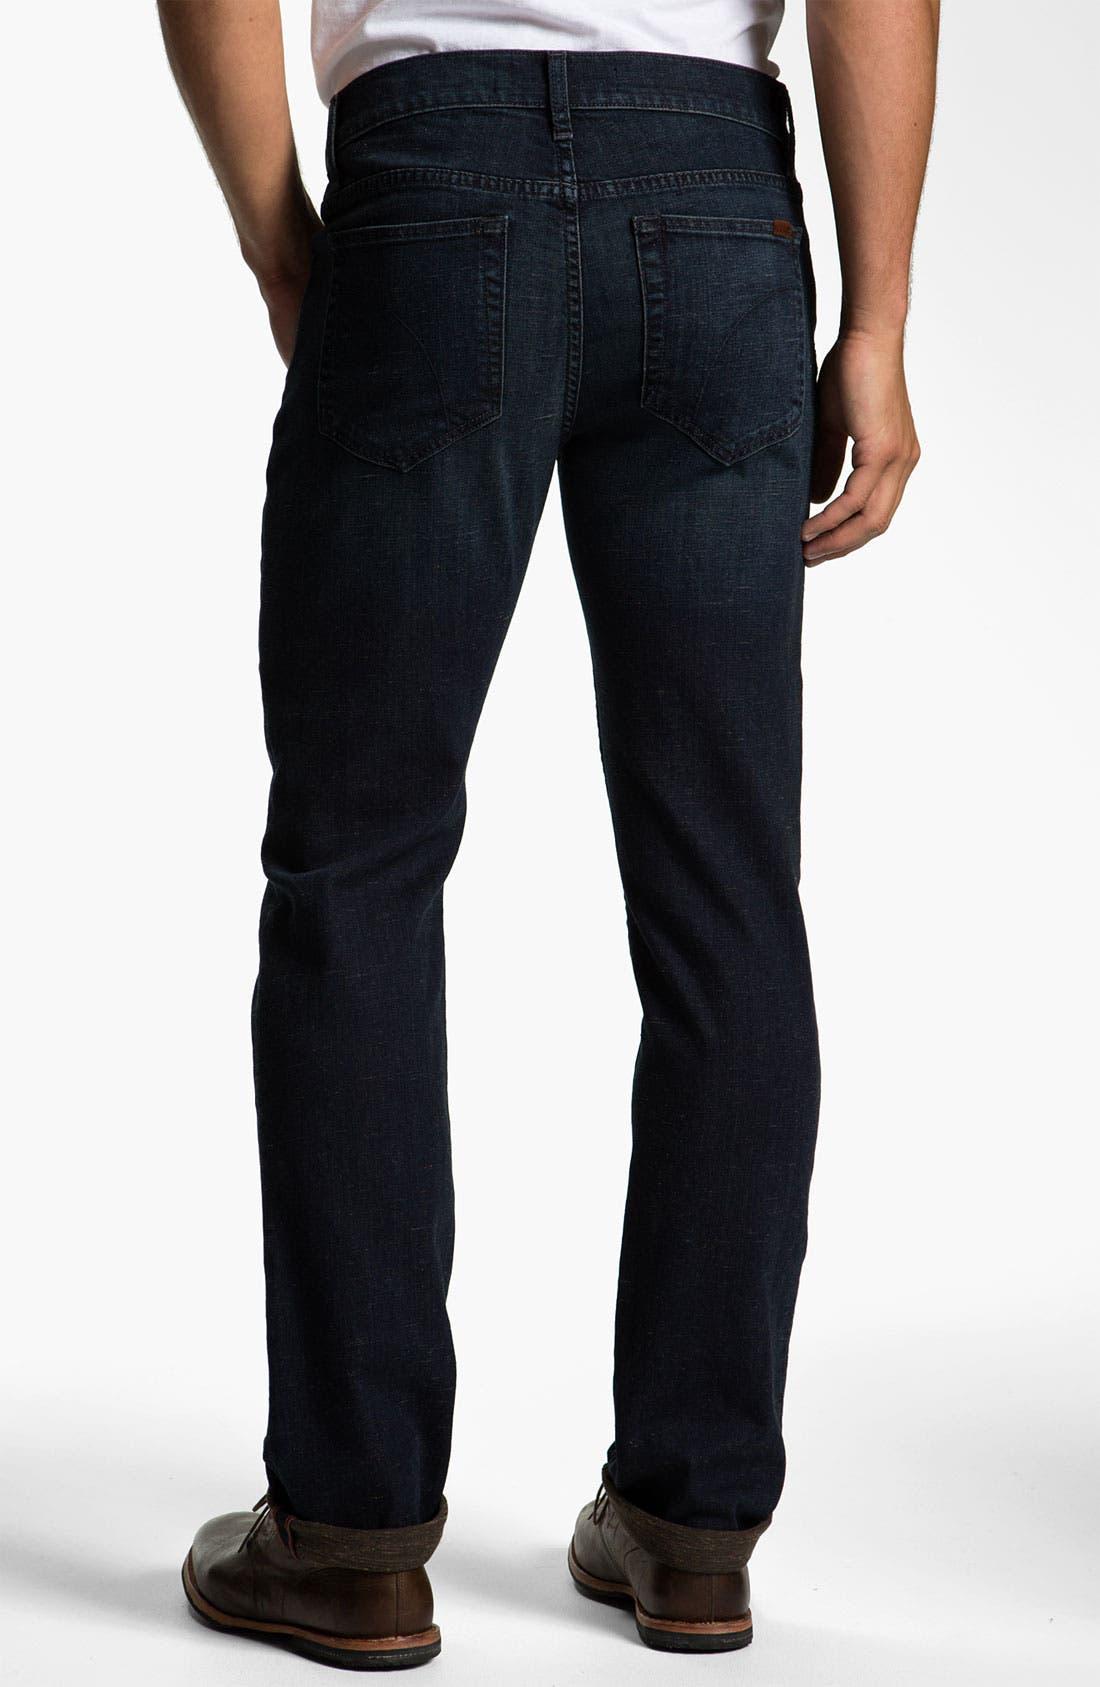 Alternate Image 1 Selected - Joe's 'Brixton' Slim Straight Leg Jeans (Declan)